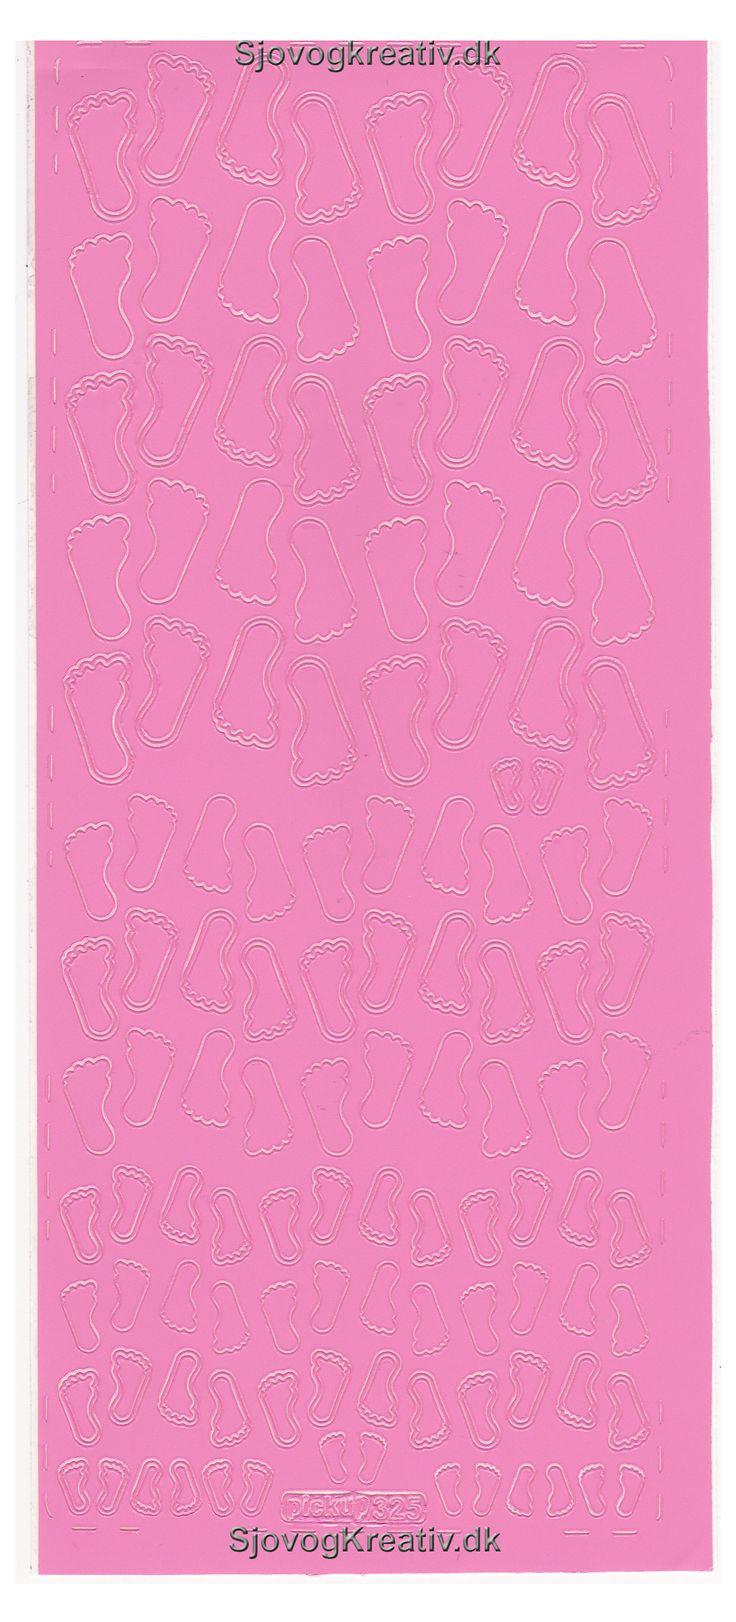 Stickers ark med små lyserøde baby fødder til lav selv kort, takkekort bordkort, sange og scrapbog til barnedåben fra sjovogkreativ.dk